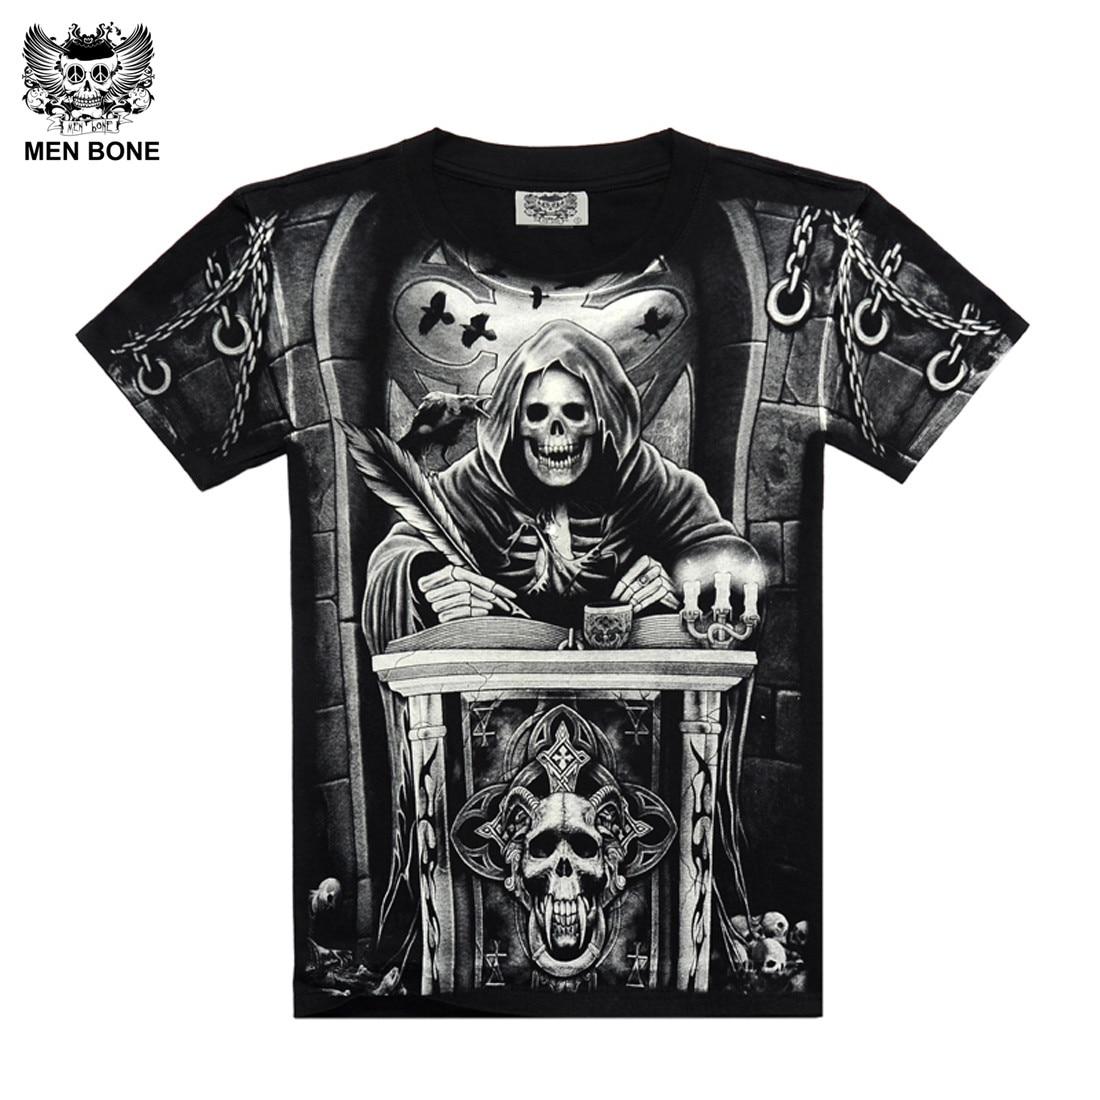 8cf2bf8a8 [Men bone] Heavy Metal Style grim Reaper skull Tshirt black Black Print  shirt Hip Hop street rock heavy metal sleeve